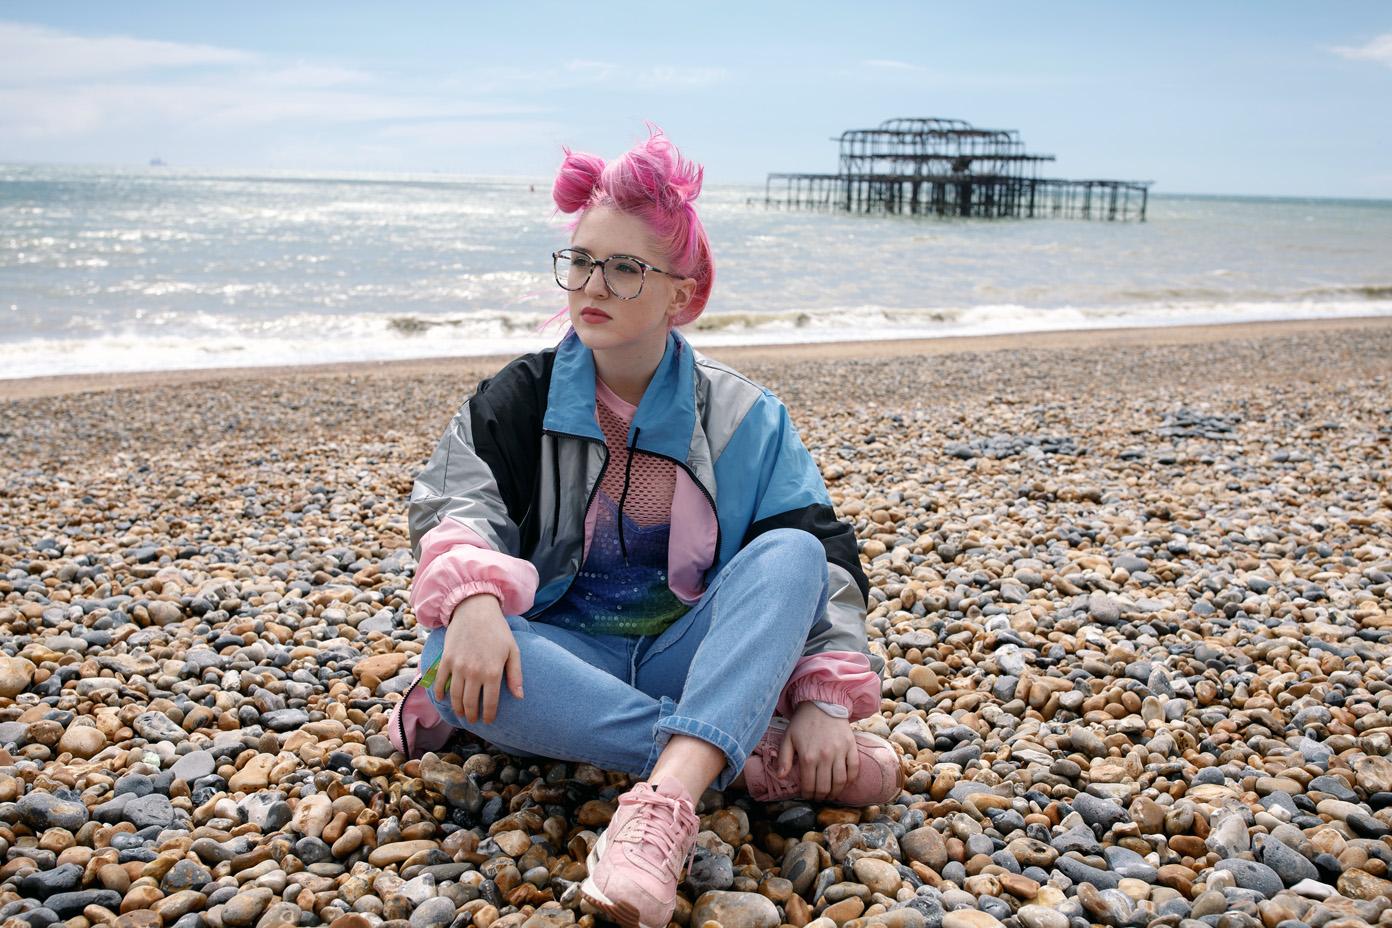 Be Charlotte's Charlotte Brimner in Brighton, UK on 19 May 2017. Photo: Katy Blackwood